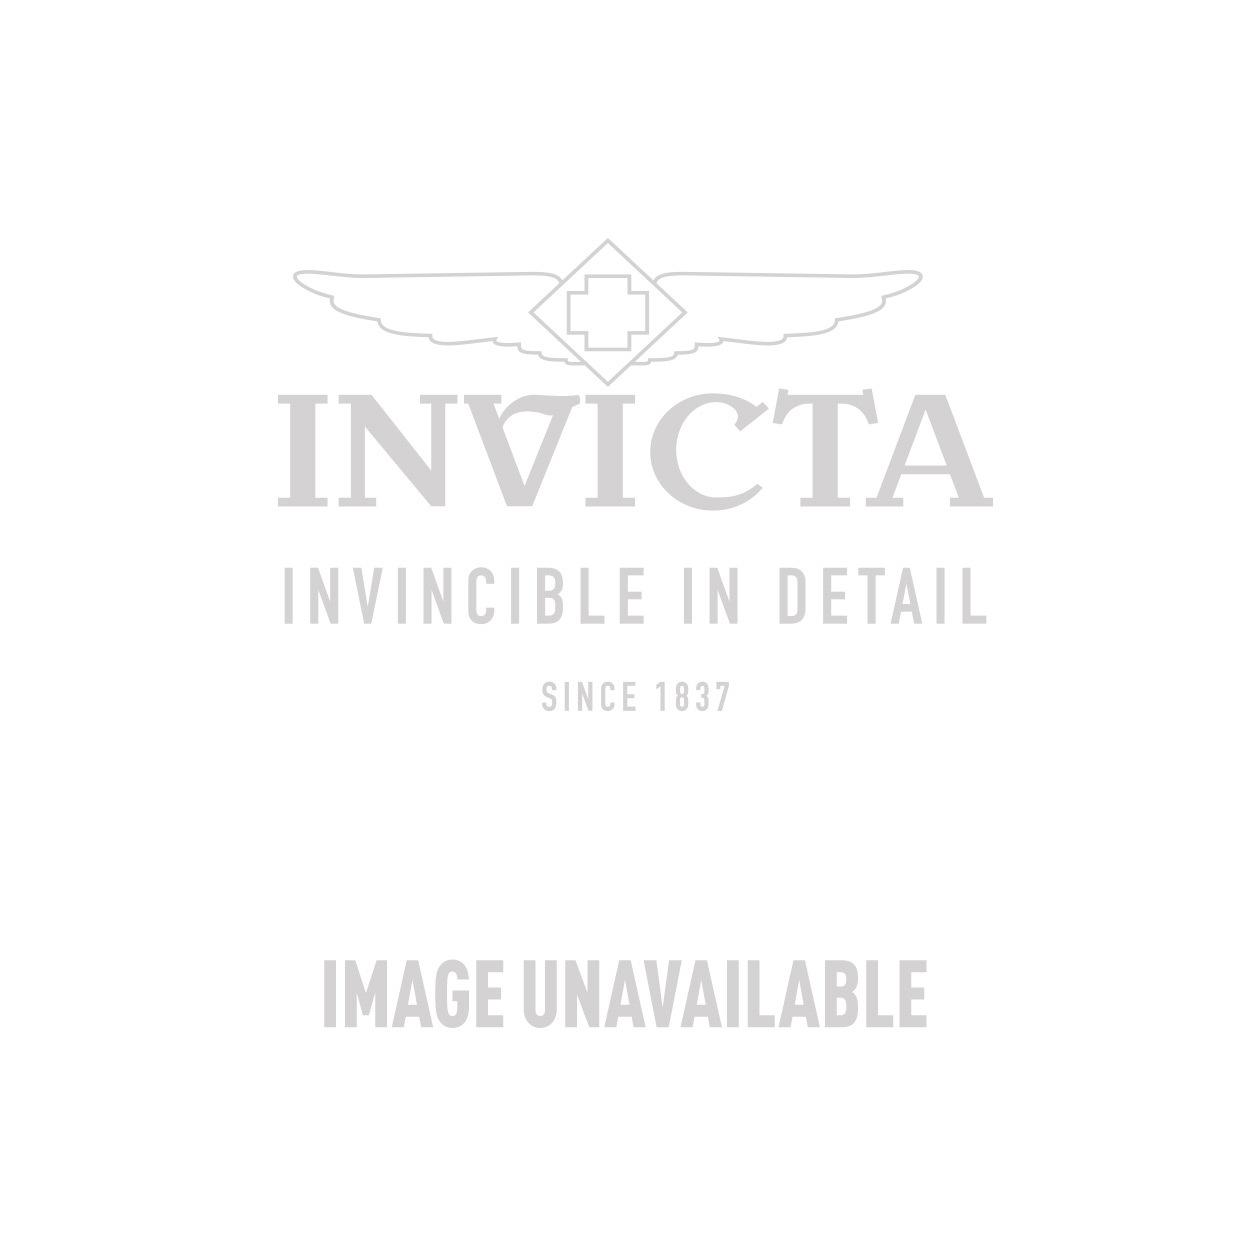 Invicta Subaqua  NOMA III Mens Quartz 50mm Olive Green Case  Stainless Steel Dial Model  - 19338